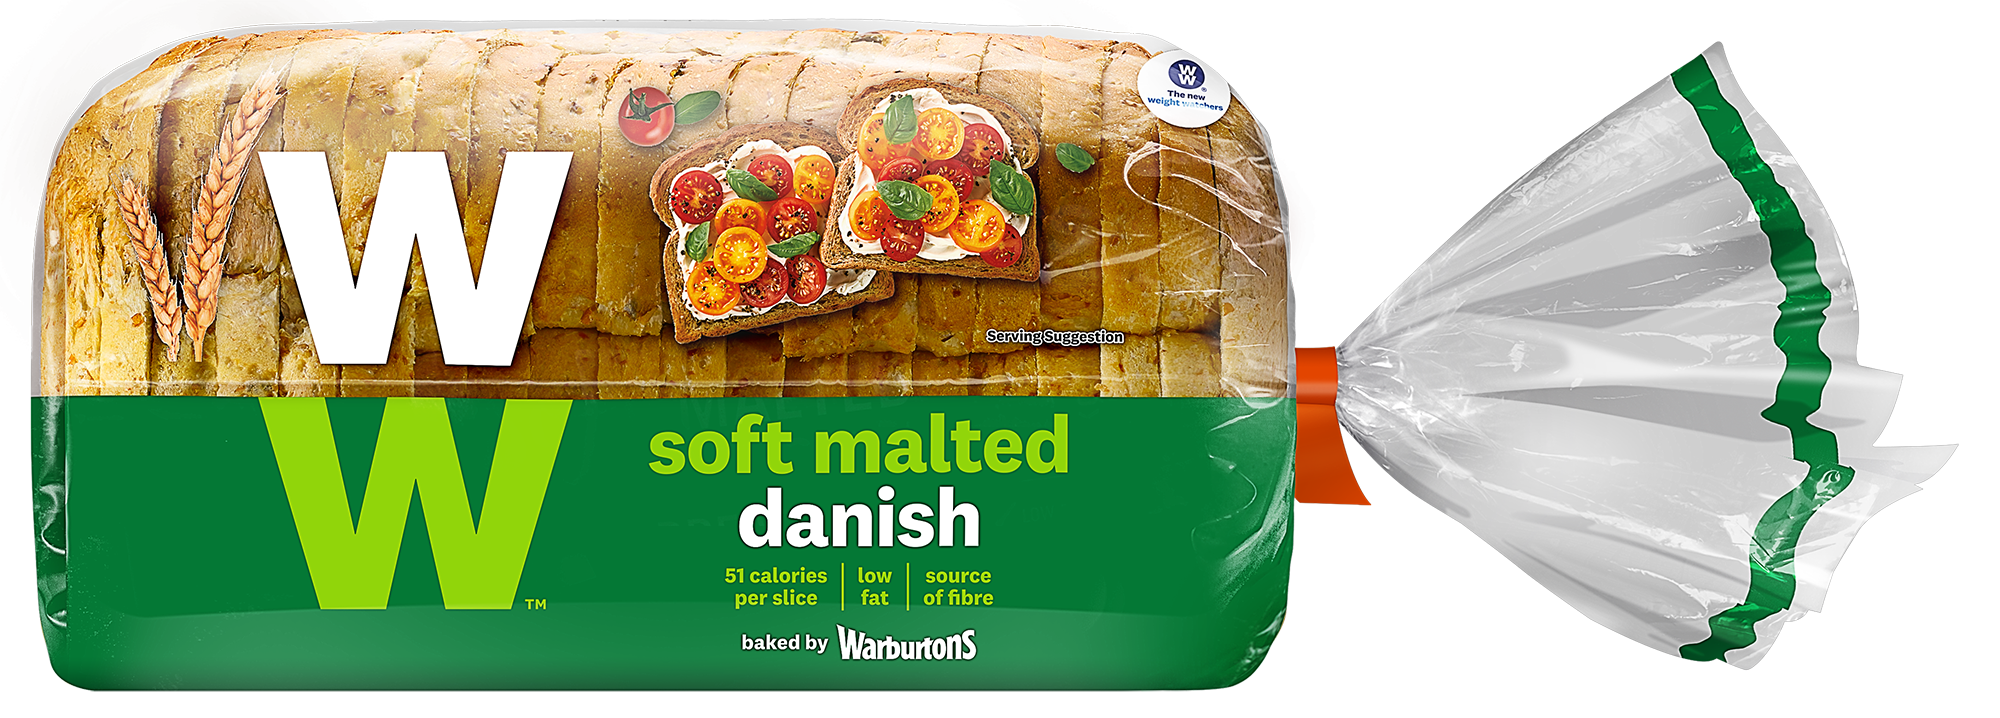 WW® Malted Danish by Warburtons